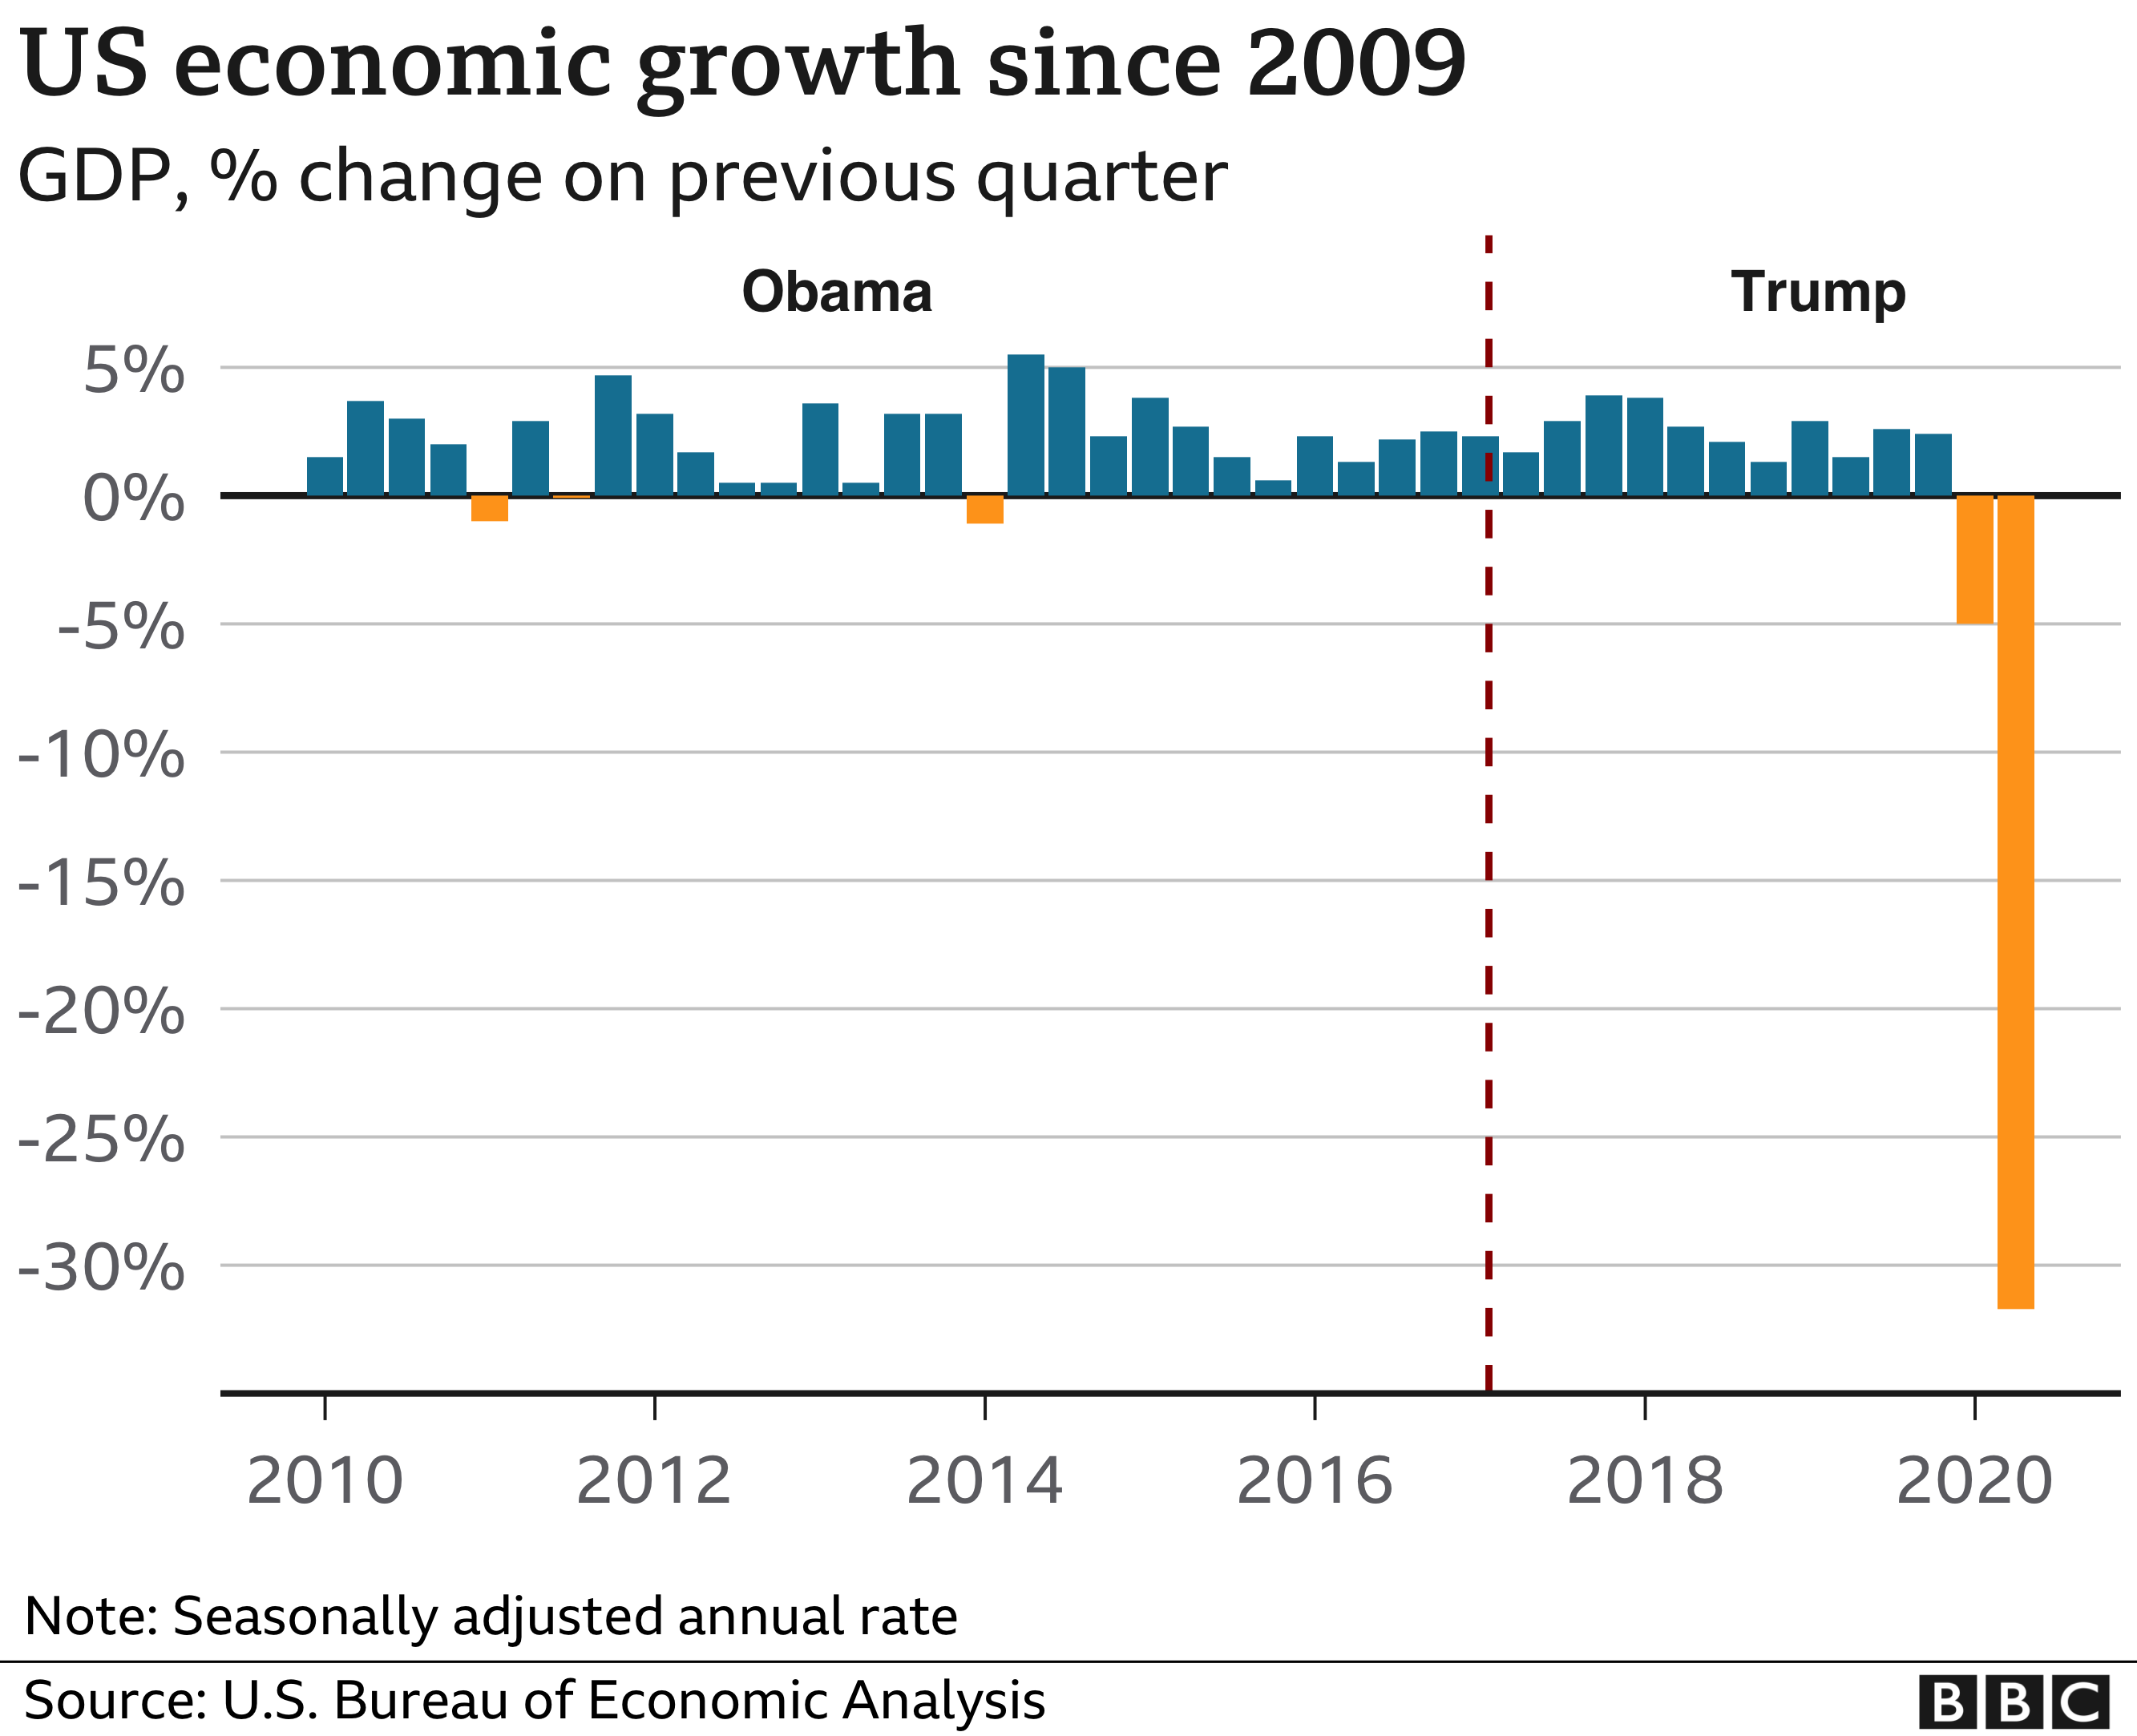 GDP since 2009